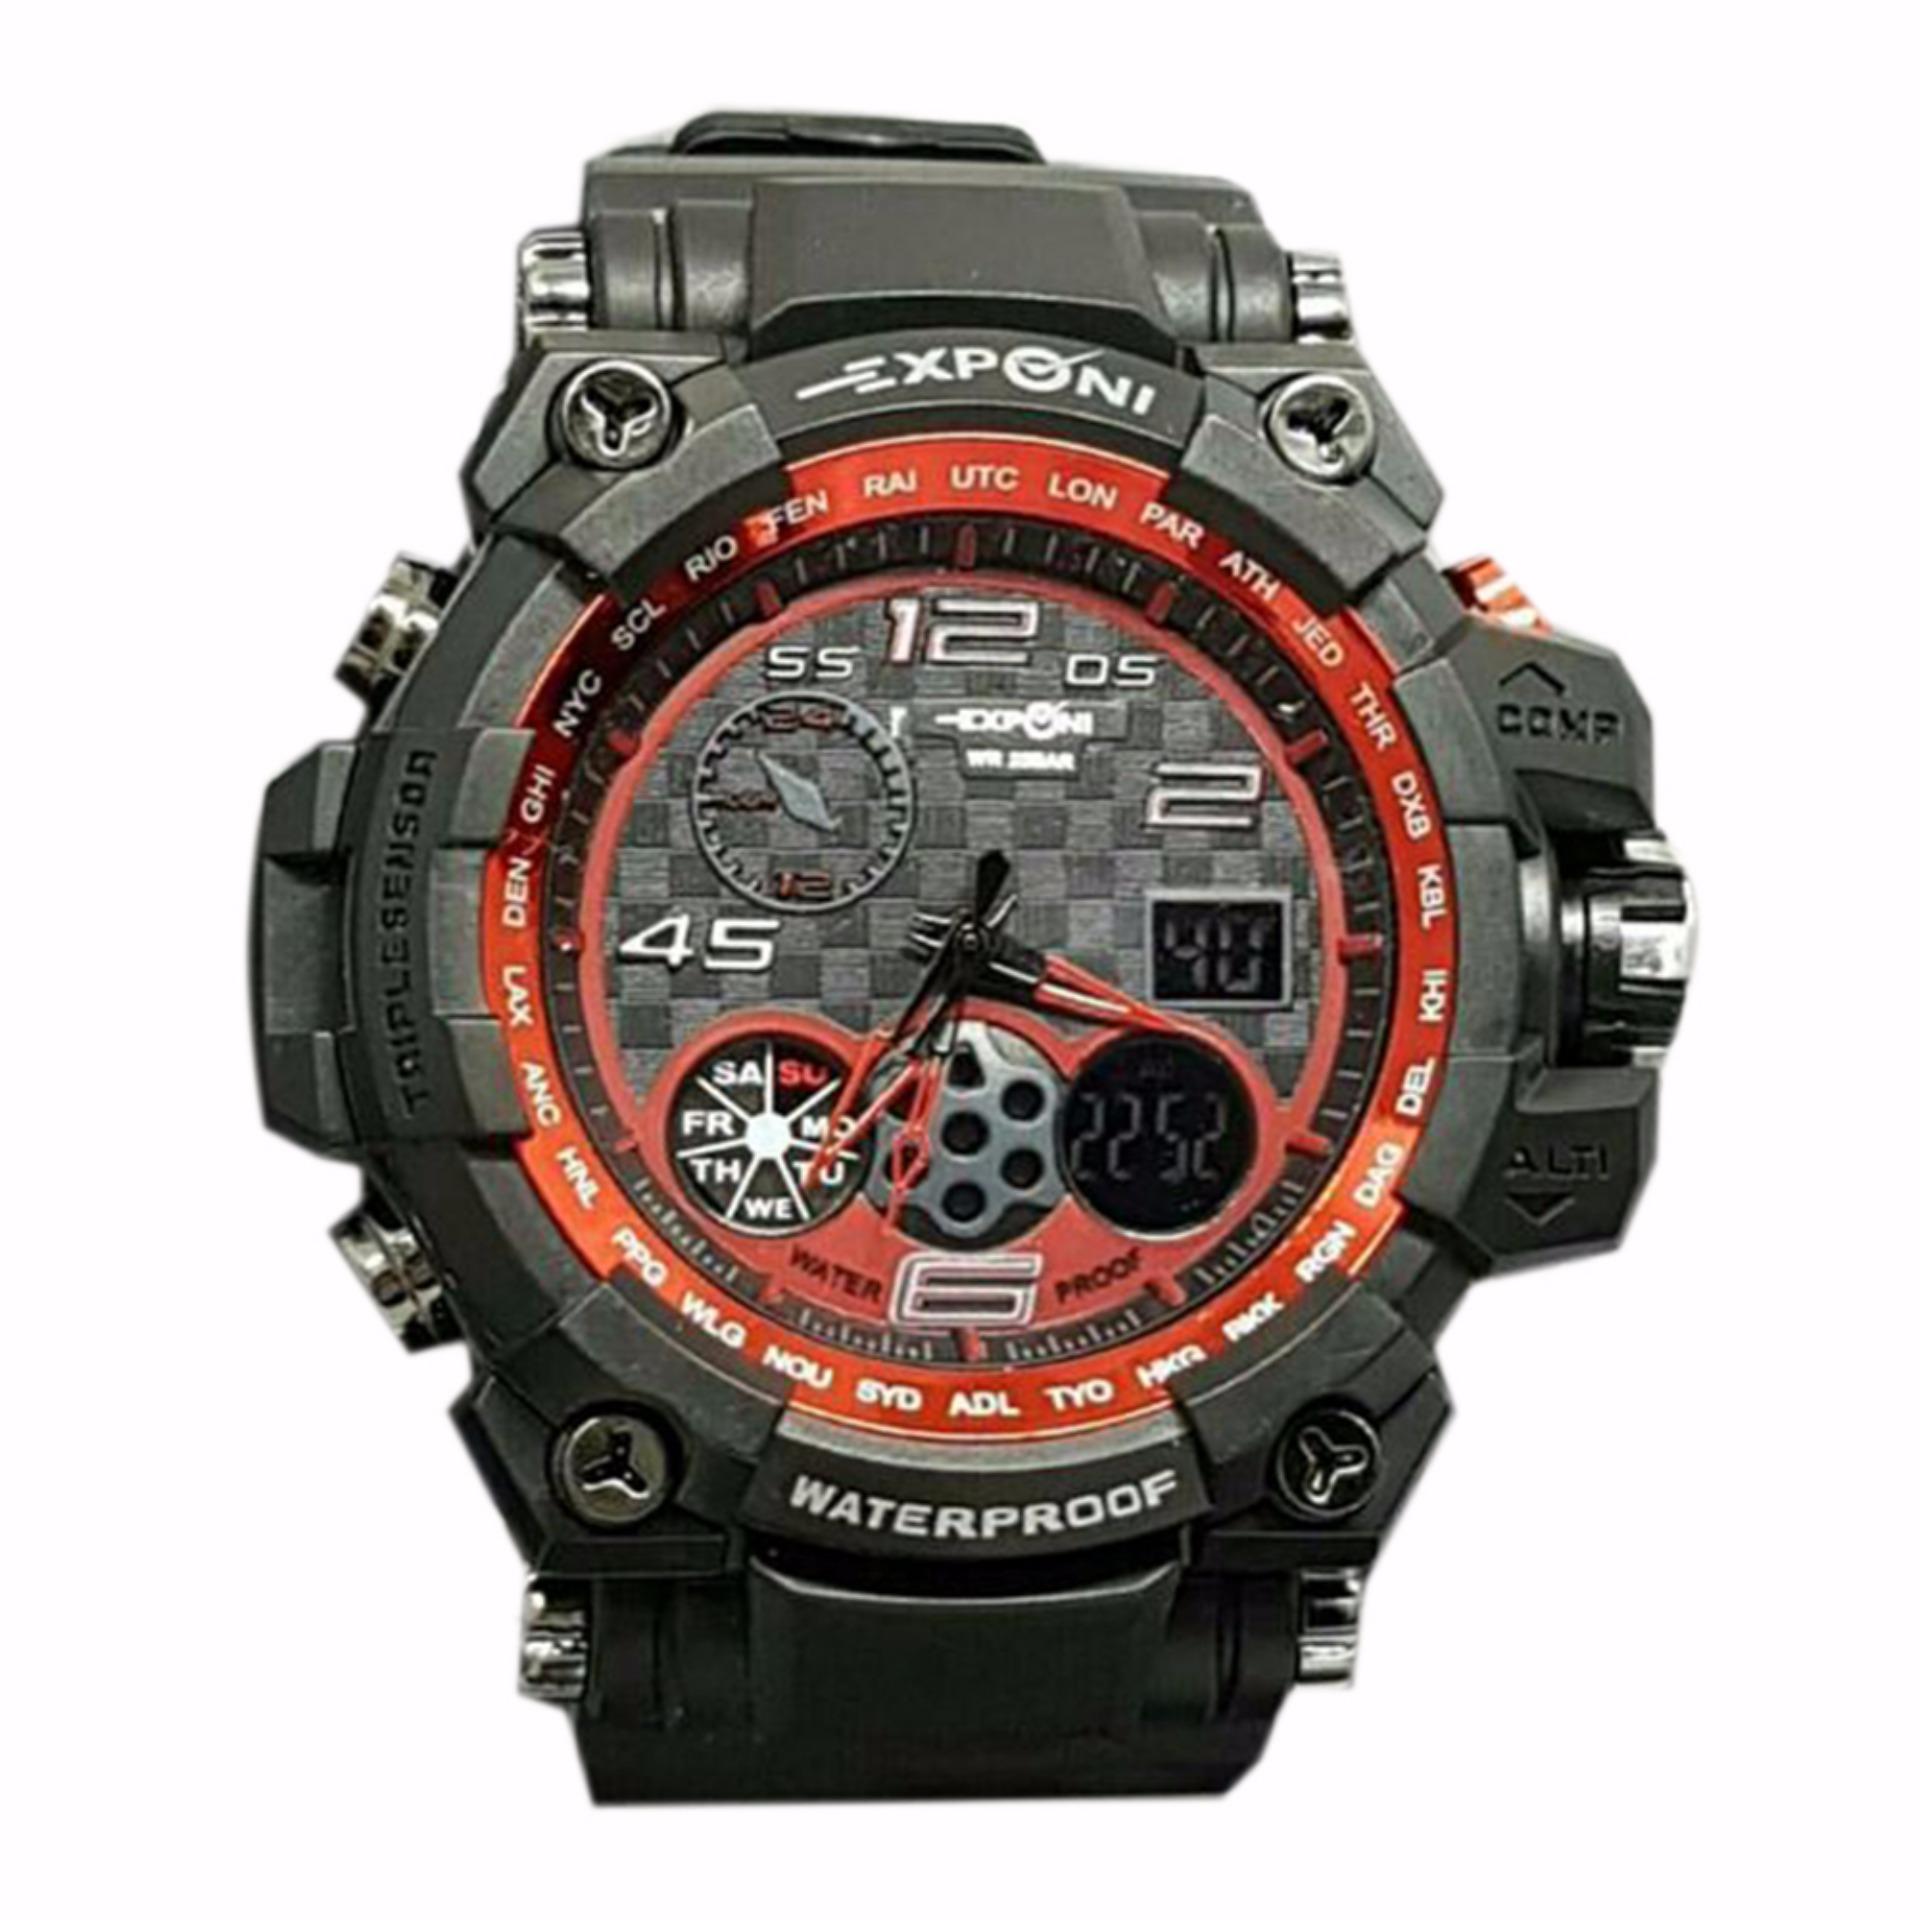 Swatch Jam Tangan Wanita Strap Rubber Sw4476is Daftar Harga Original 100  Sfk397 Summer Breeze Cool Green Exponi Dual Time Ex0035m02bo Sport Watch